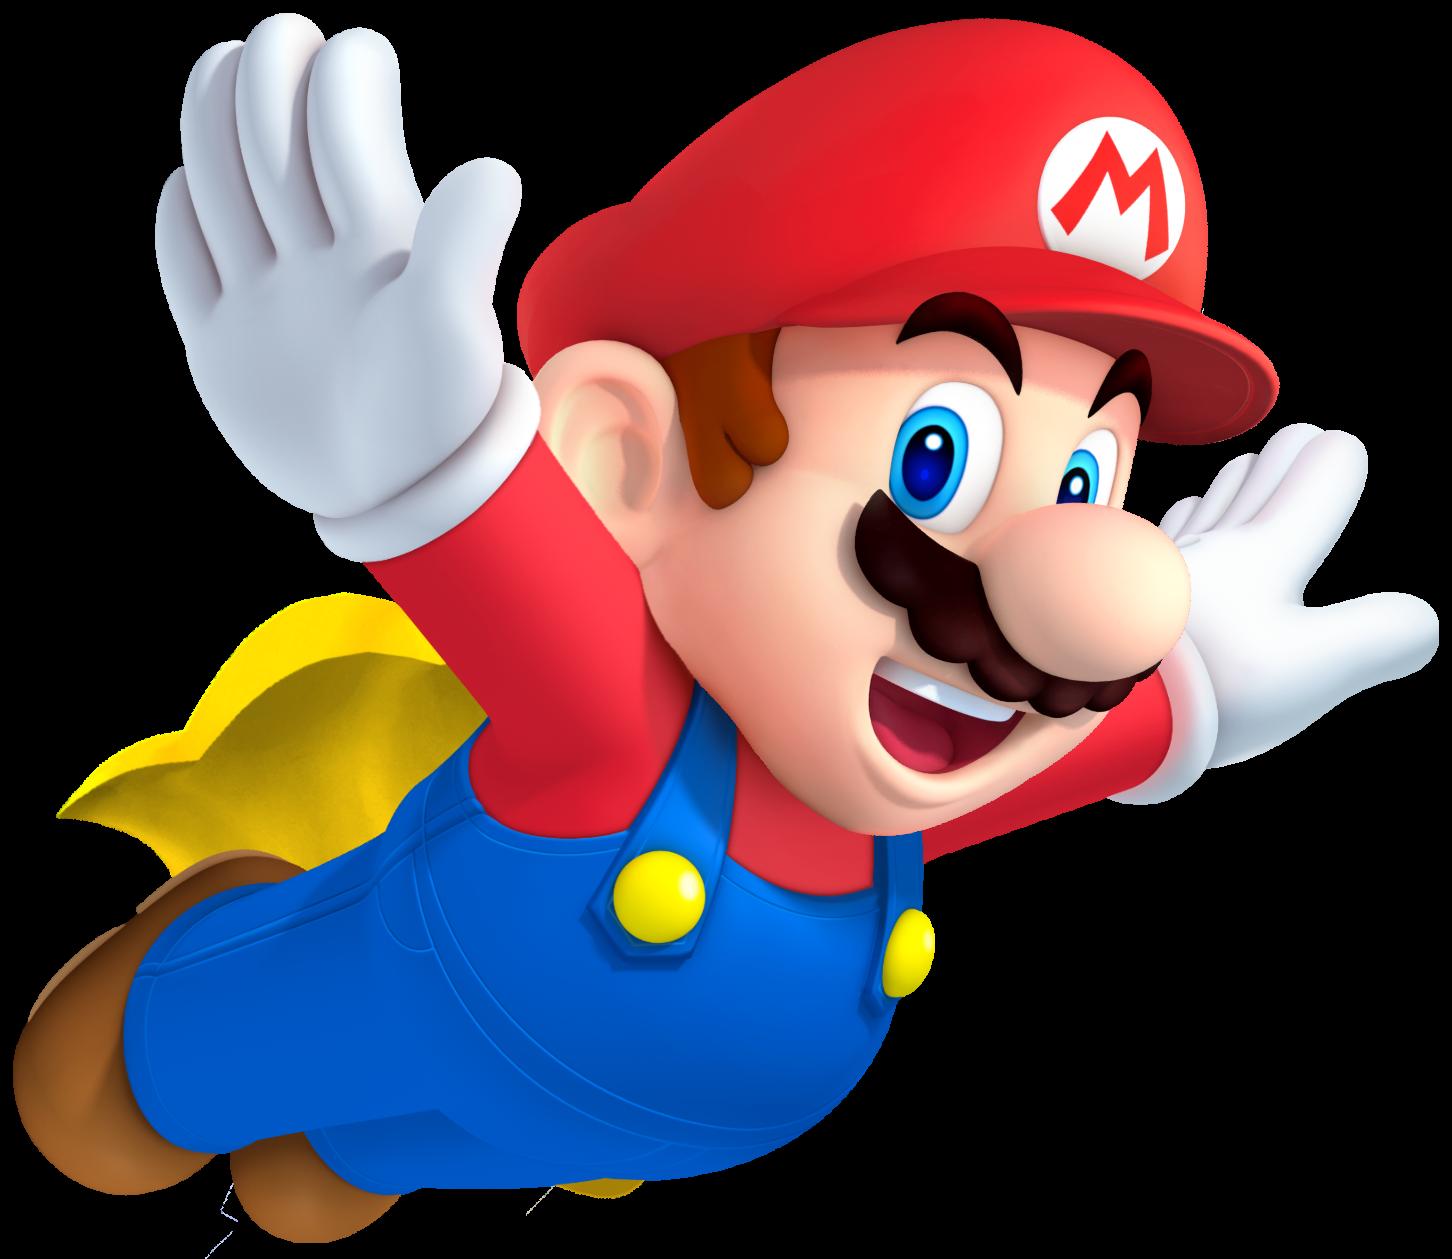 Image - Cape Mario SMWU.png   Fantendo - Nintendo Fanon ...